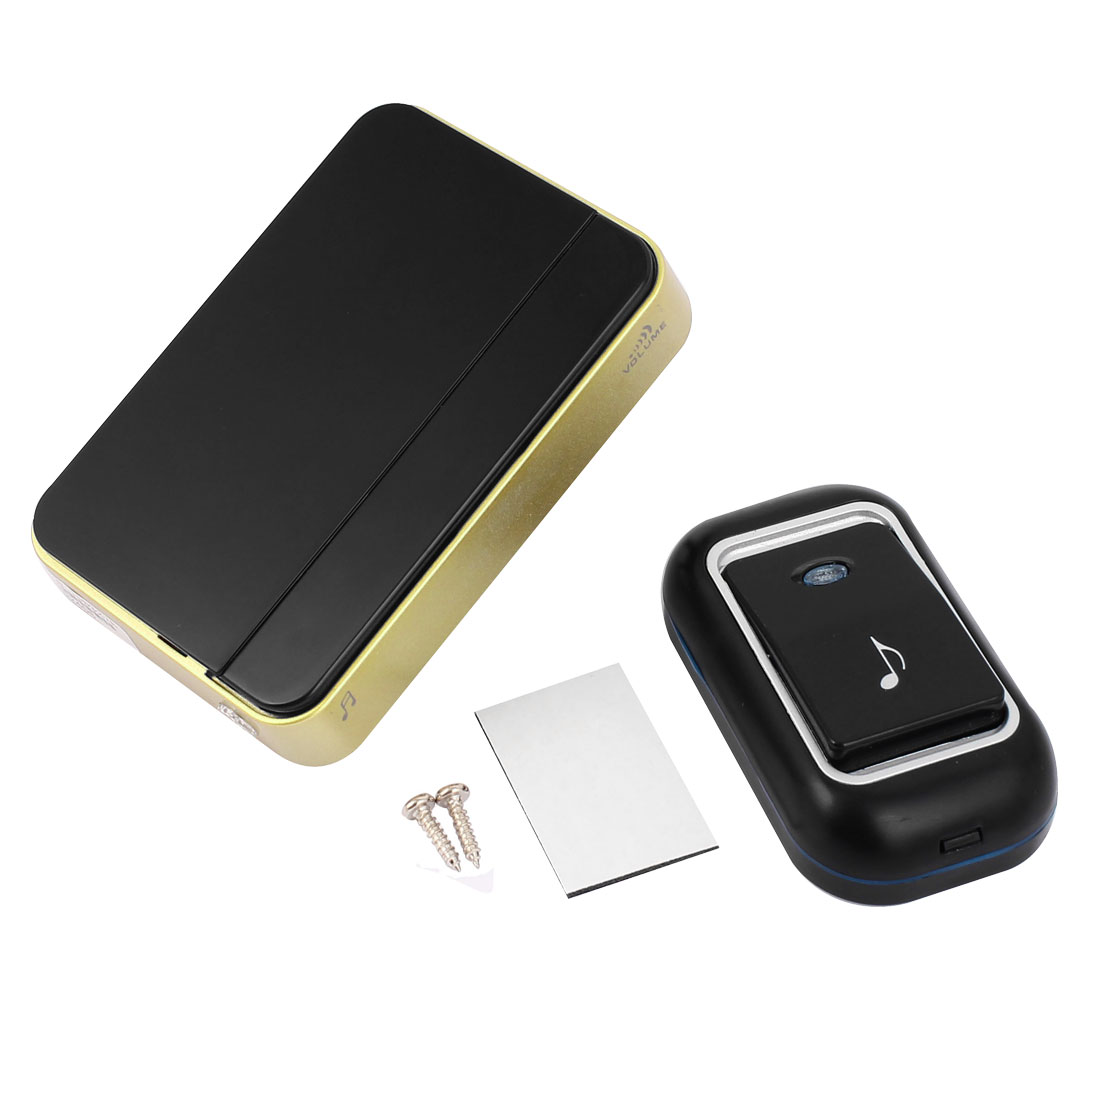 EU Plug in  Door Bell Remote Control 36 Chimes Digital Receiver Doorbell